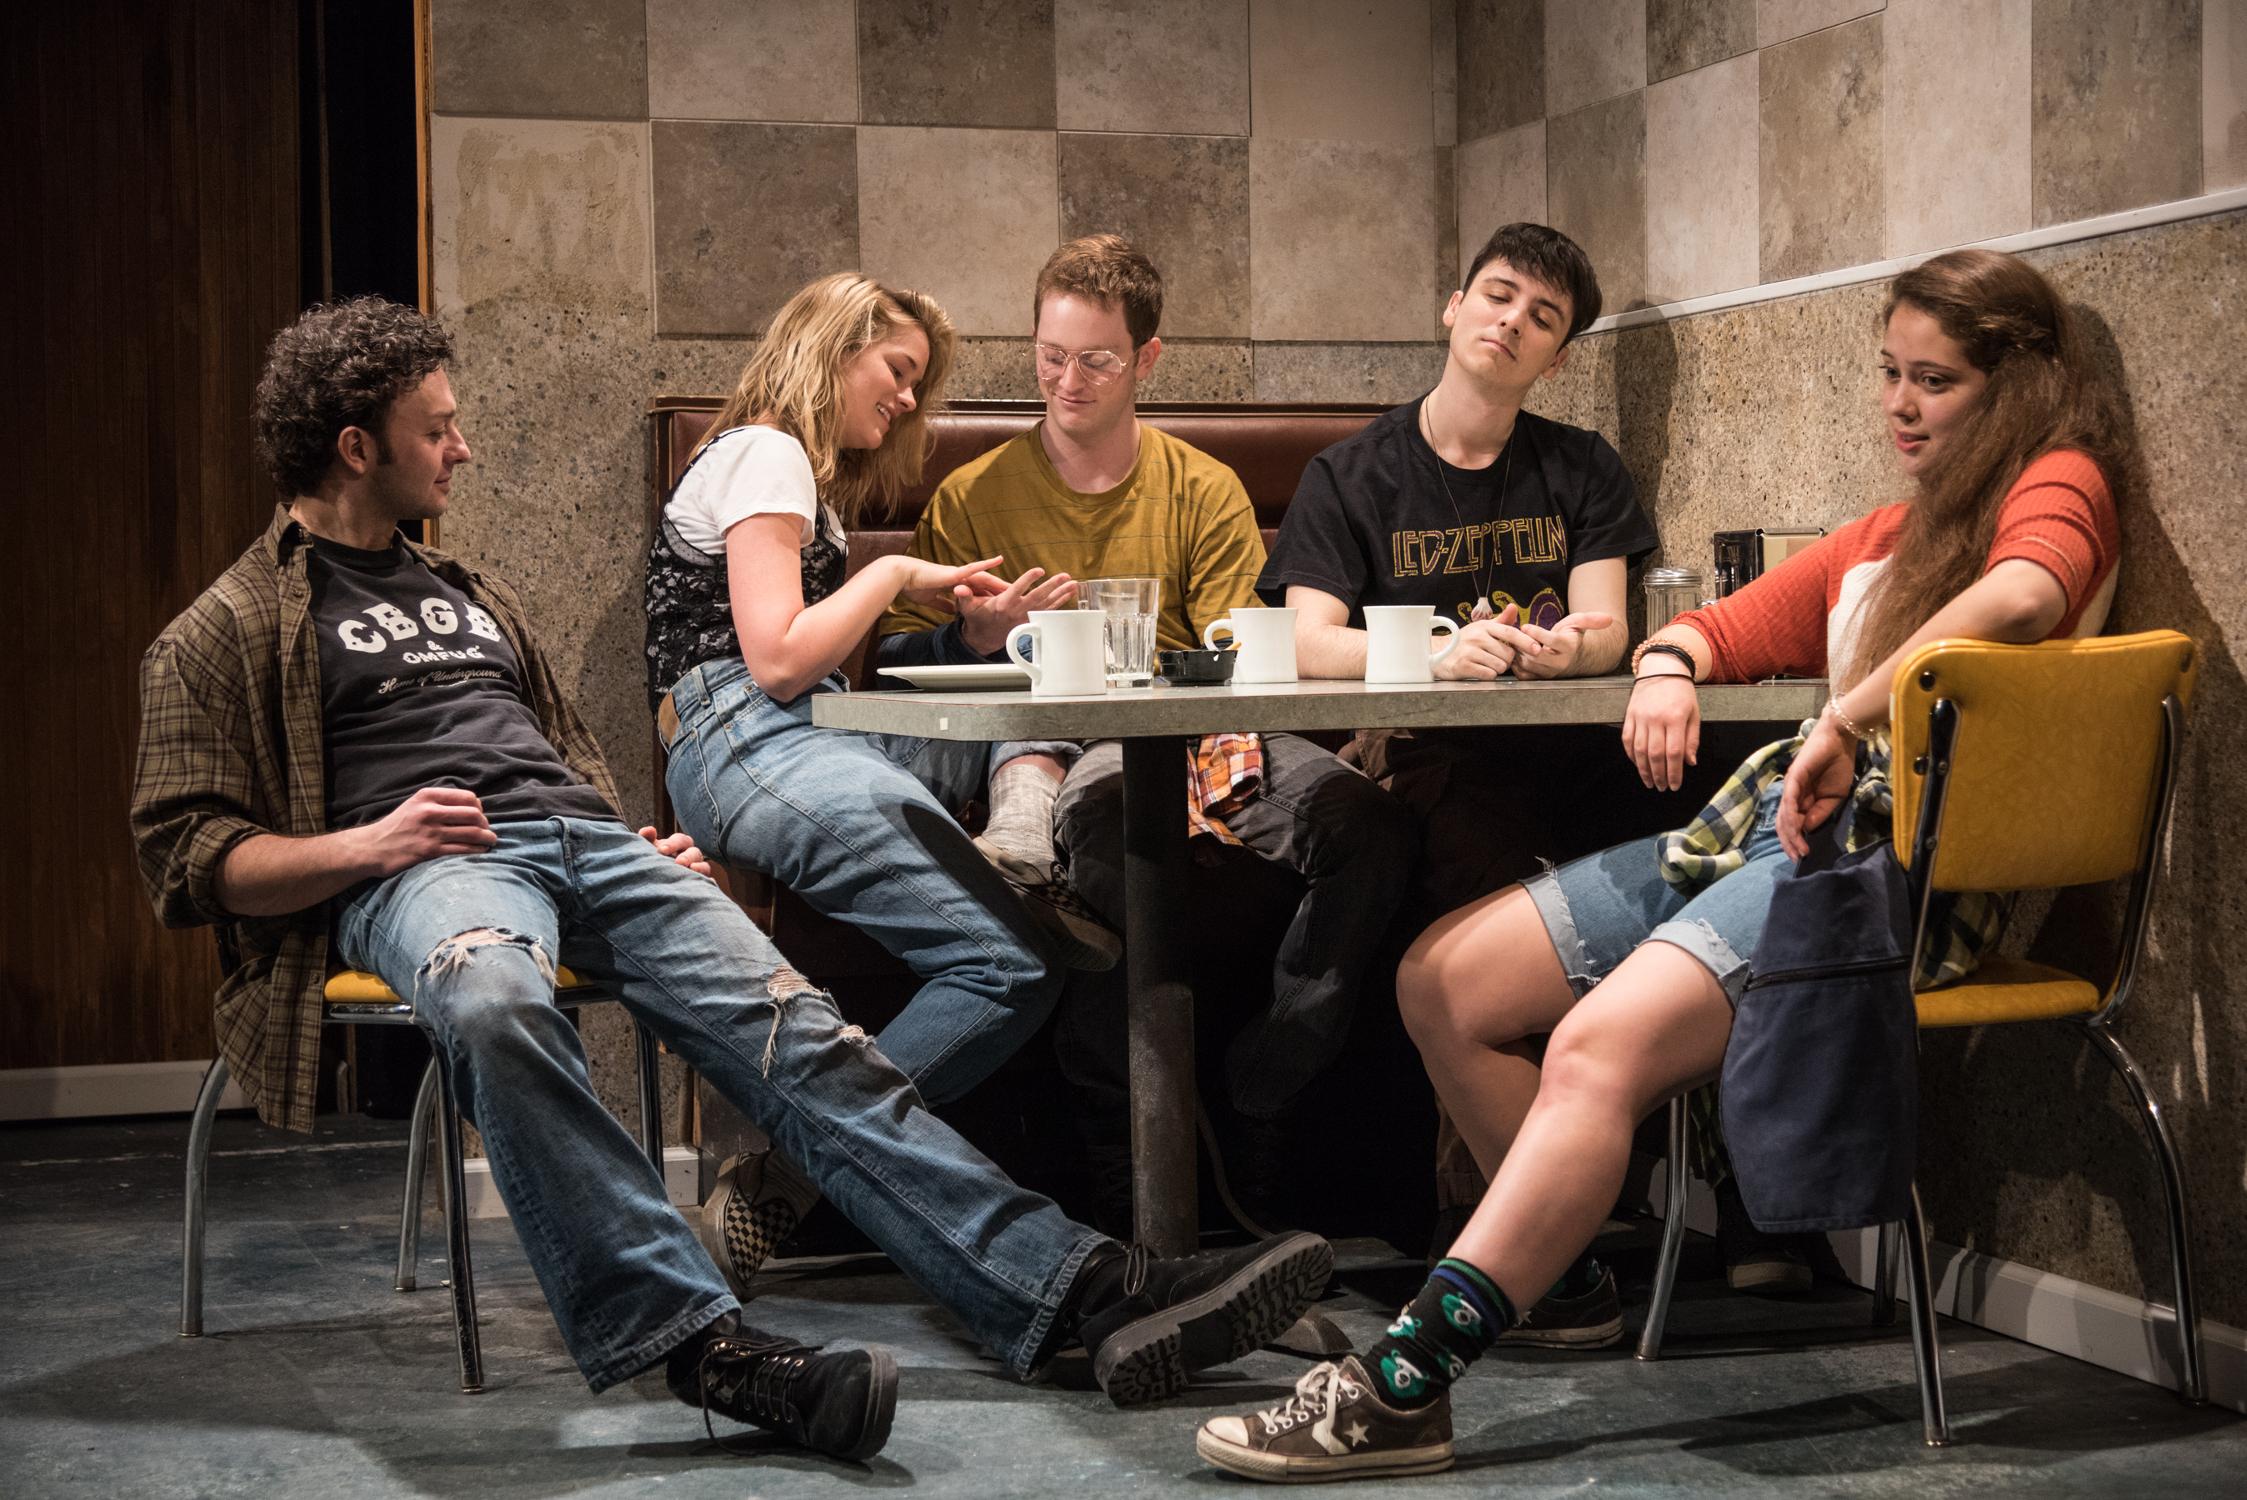 James Kautz as Adam, Elizabeth Lail as Hayley, Spencer Davis Milford as Matt, Sean Patrick Monahan as Pete, Rachel Franco as Tara. Photo credit: Russ Rowland